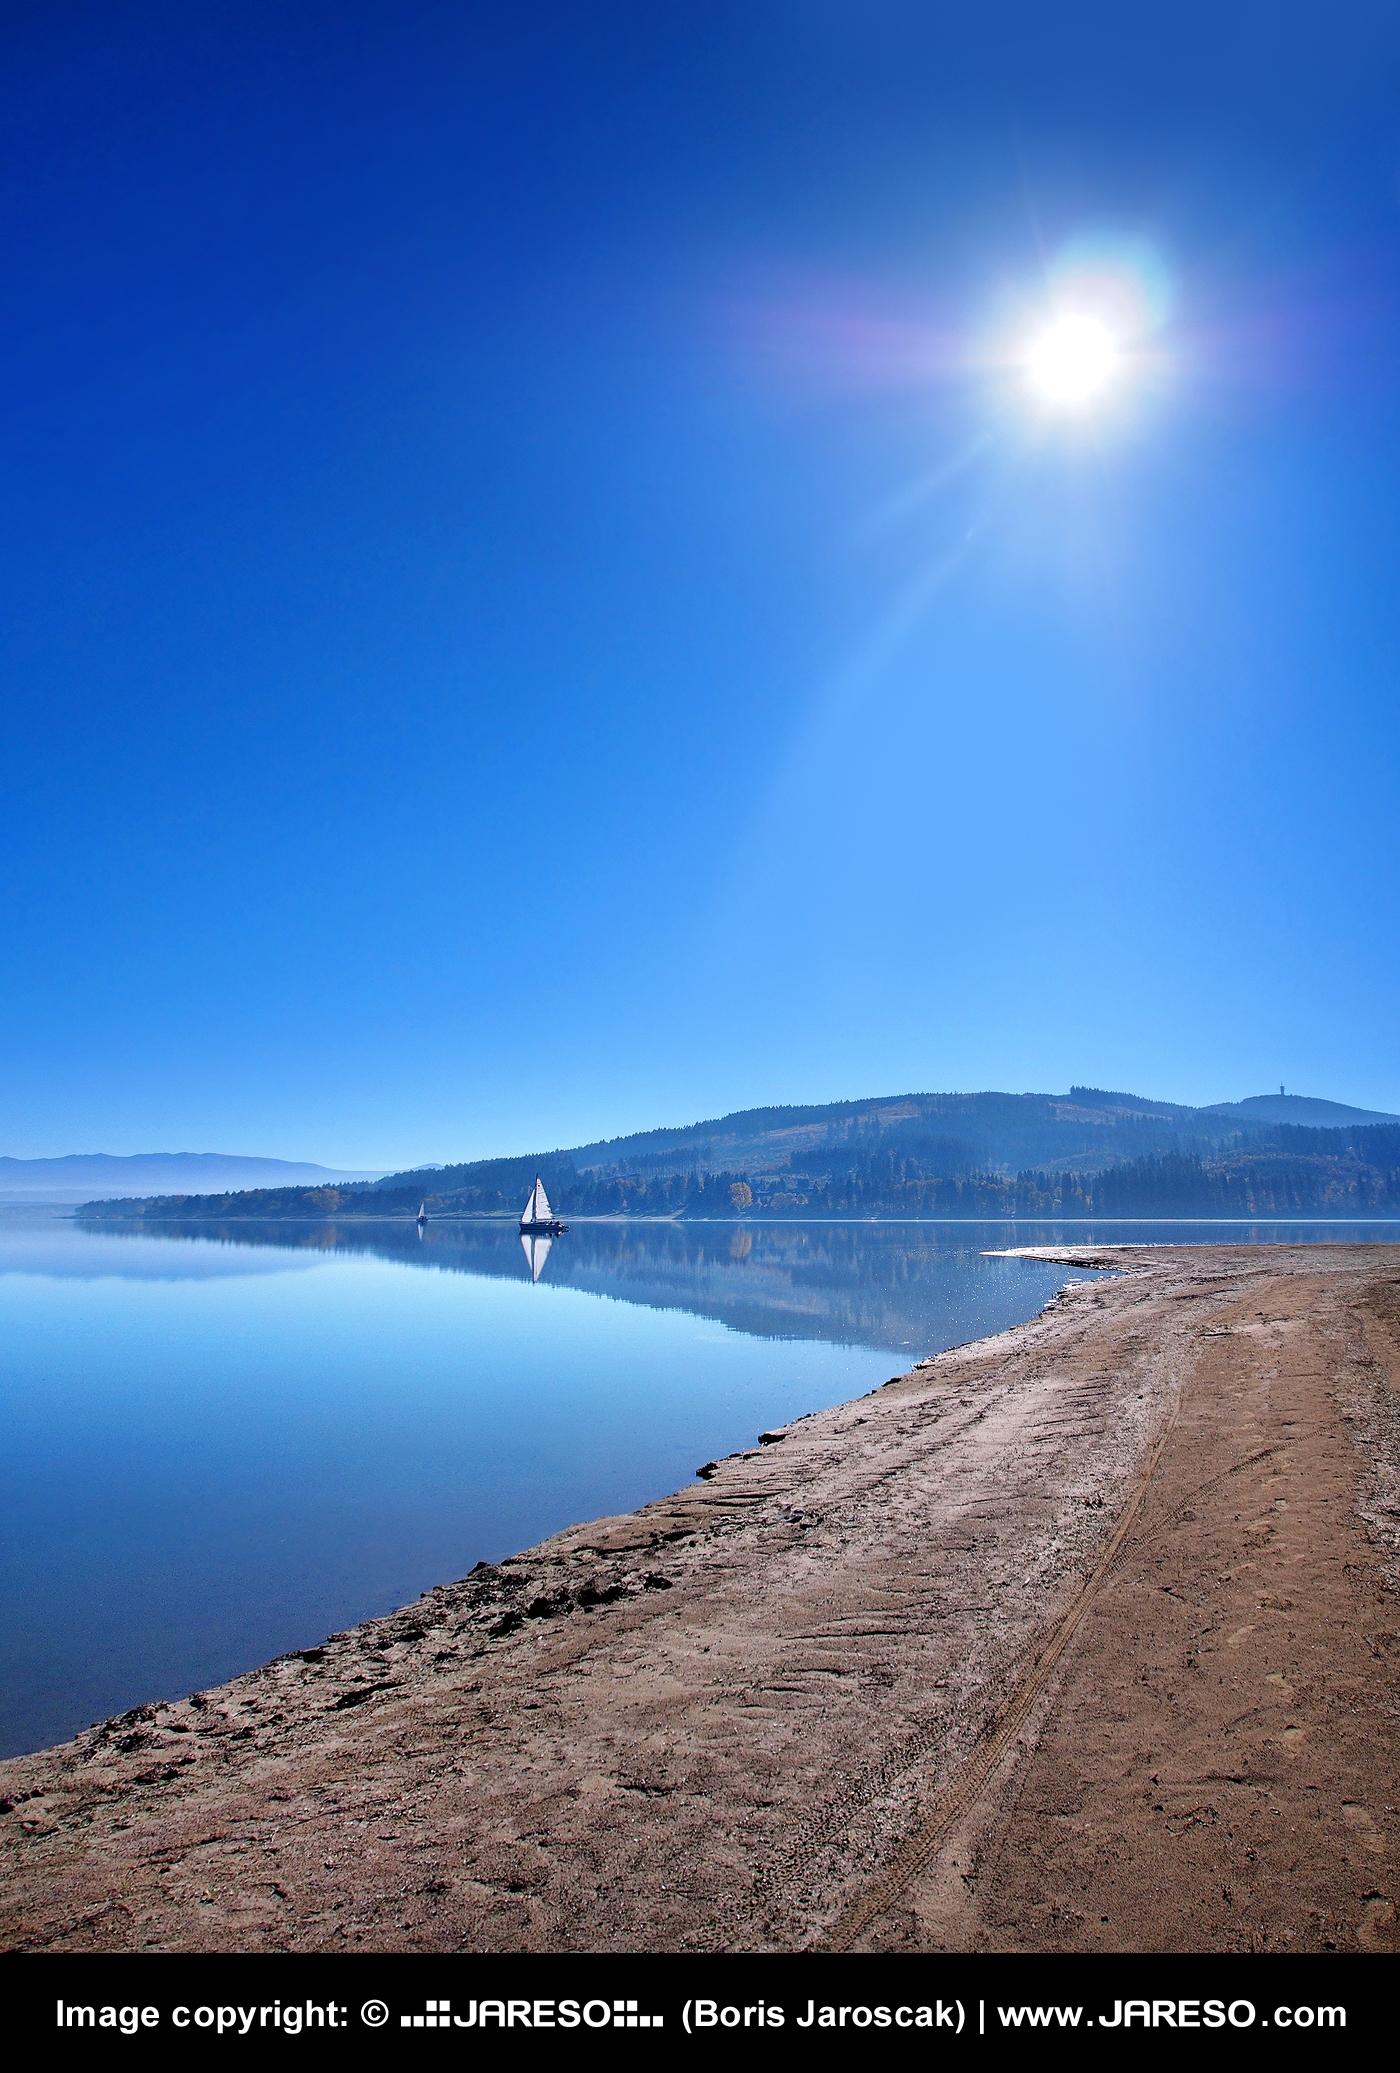 web_gplus_fb_landscape_oravska_priehrada_shore_yarchts_sun_autumn_pa200136x.jpg